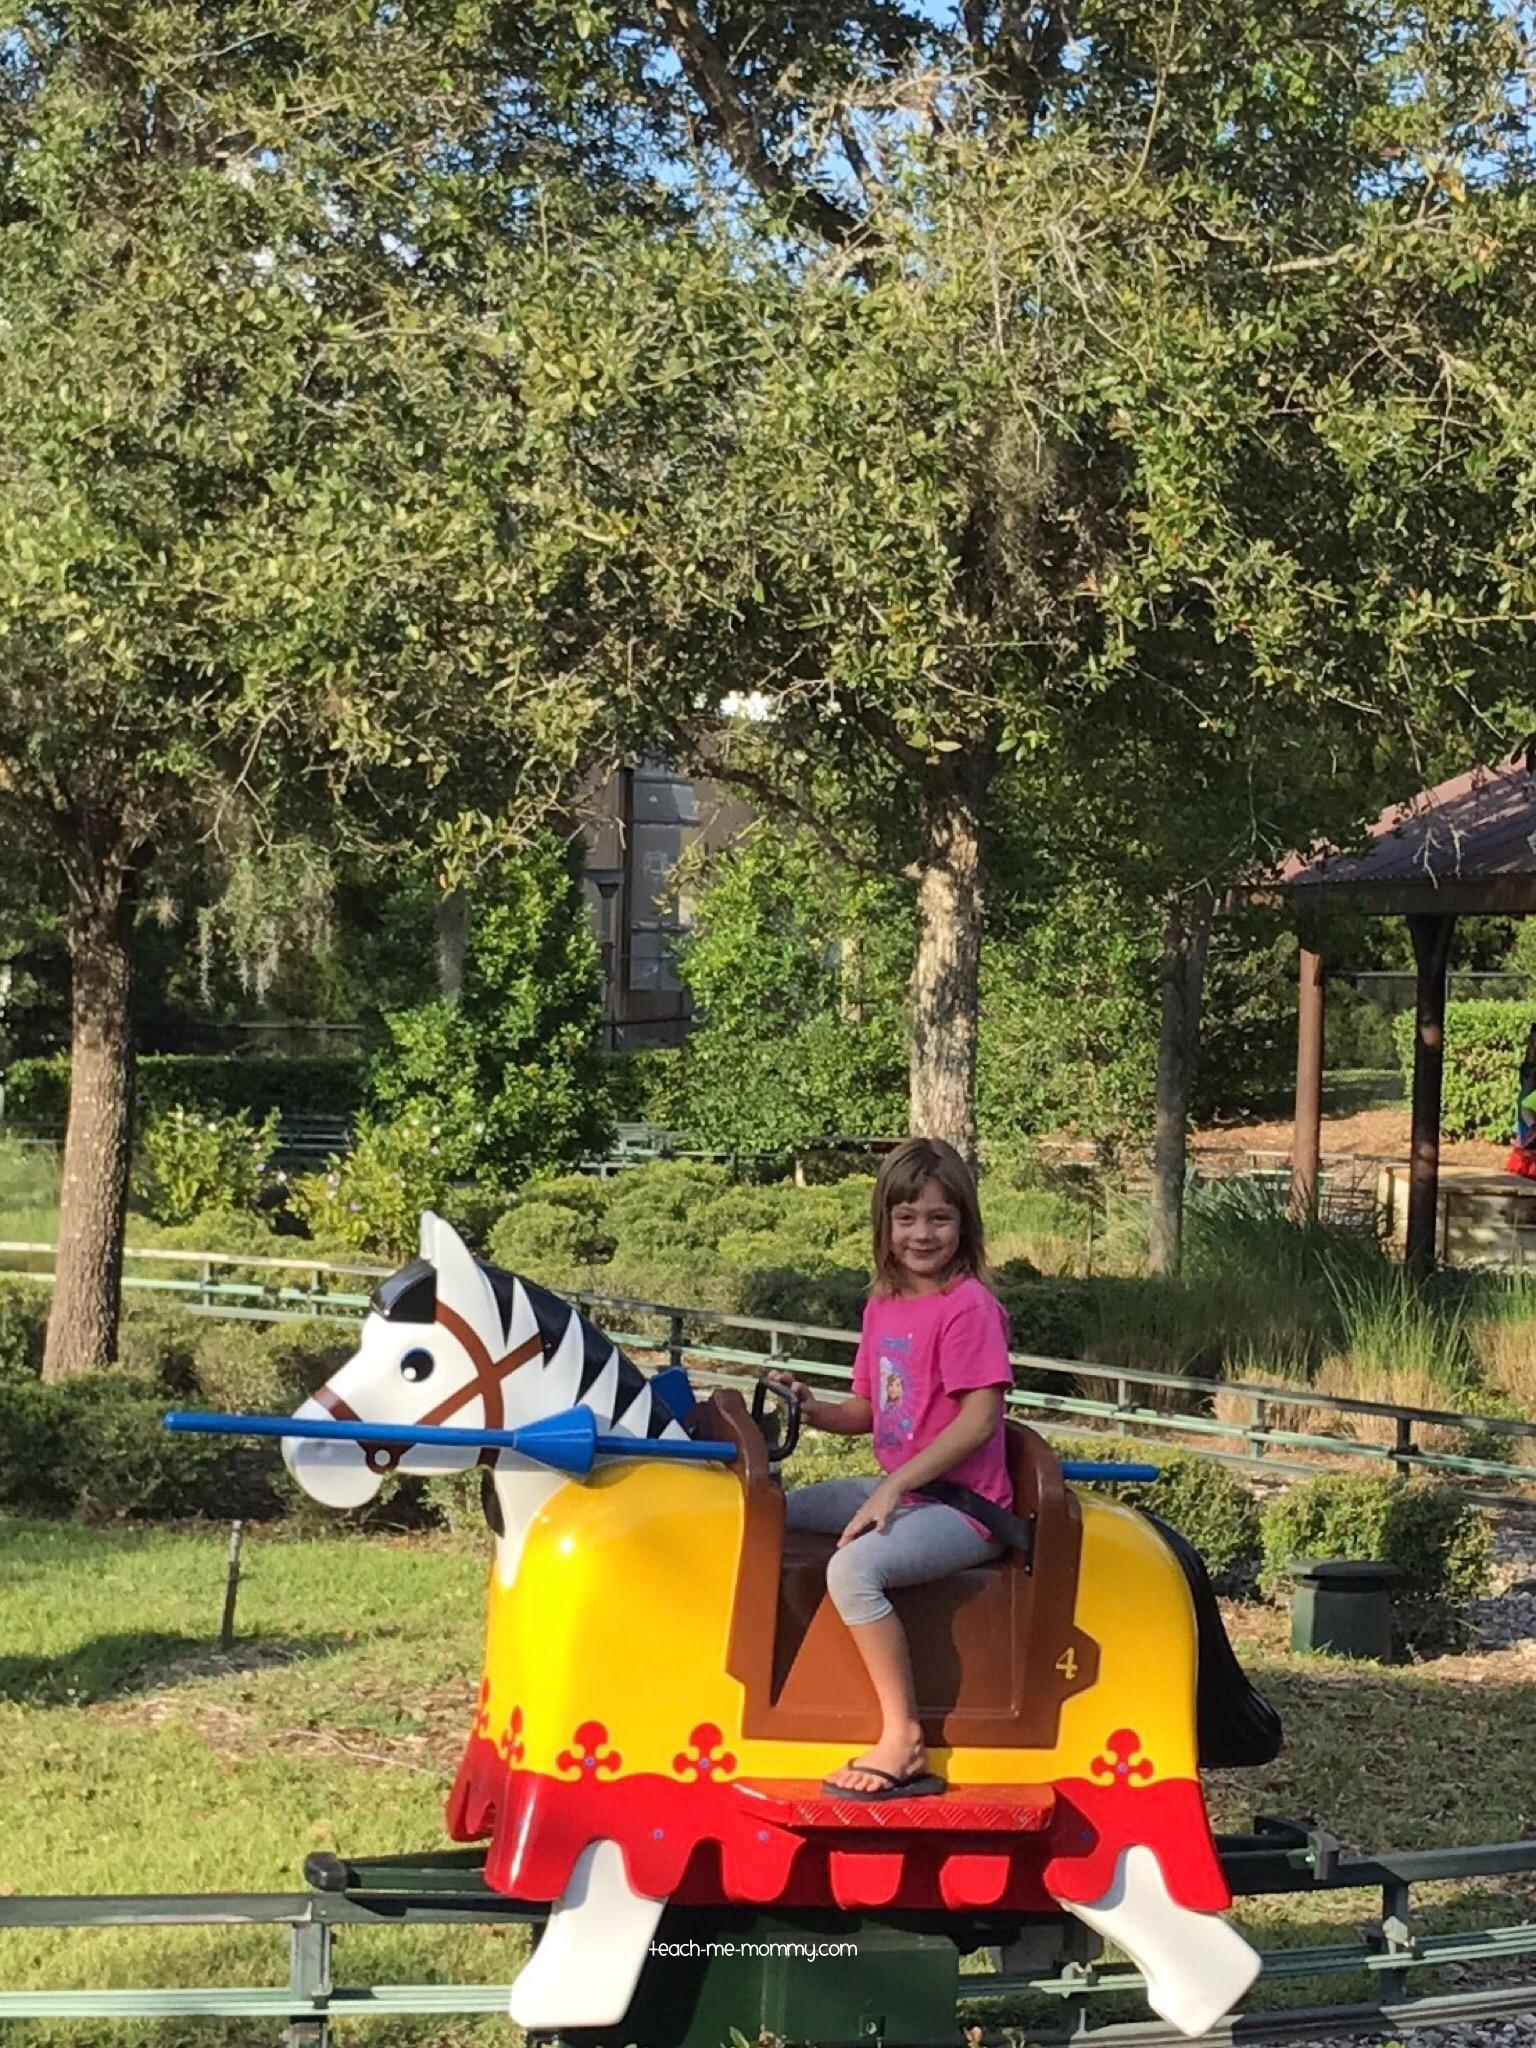 calming ride